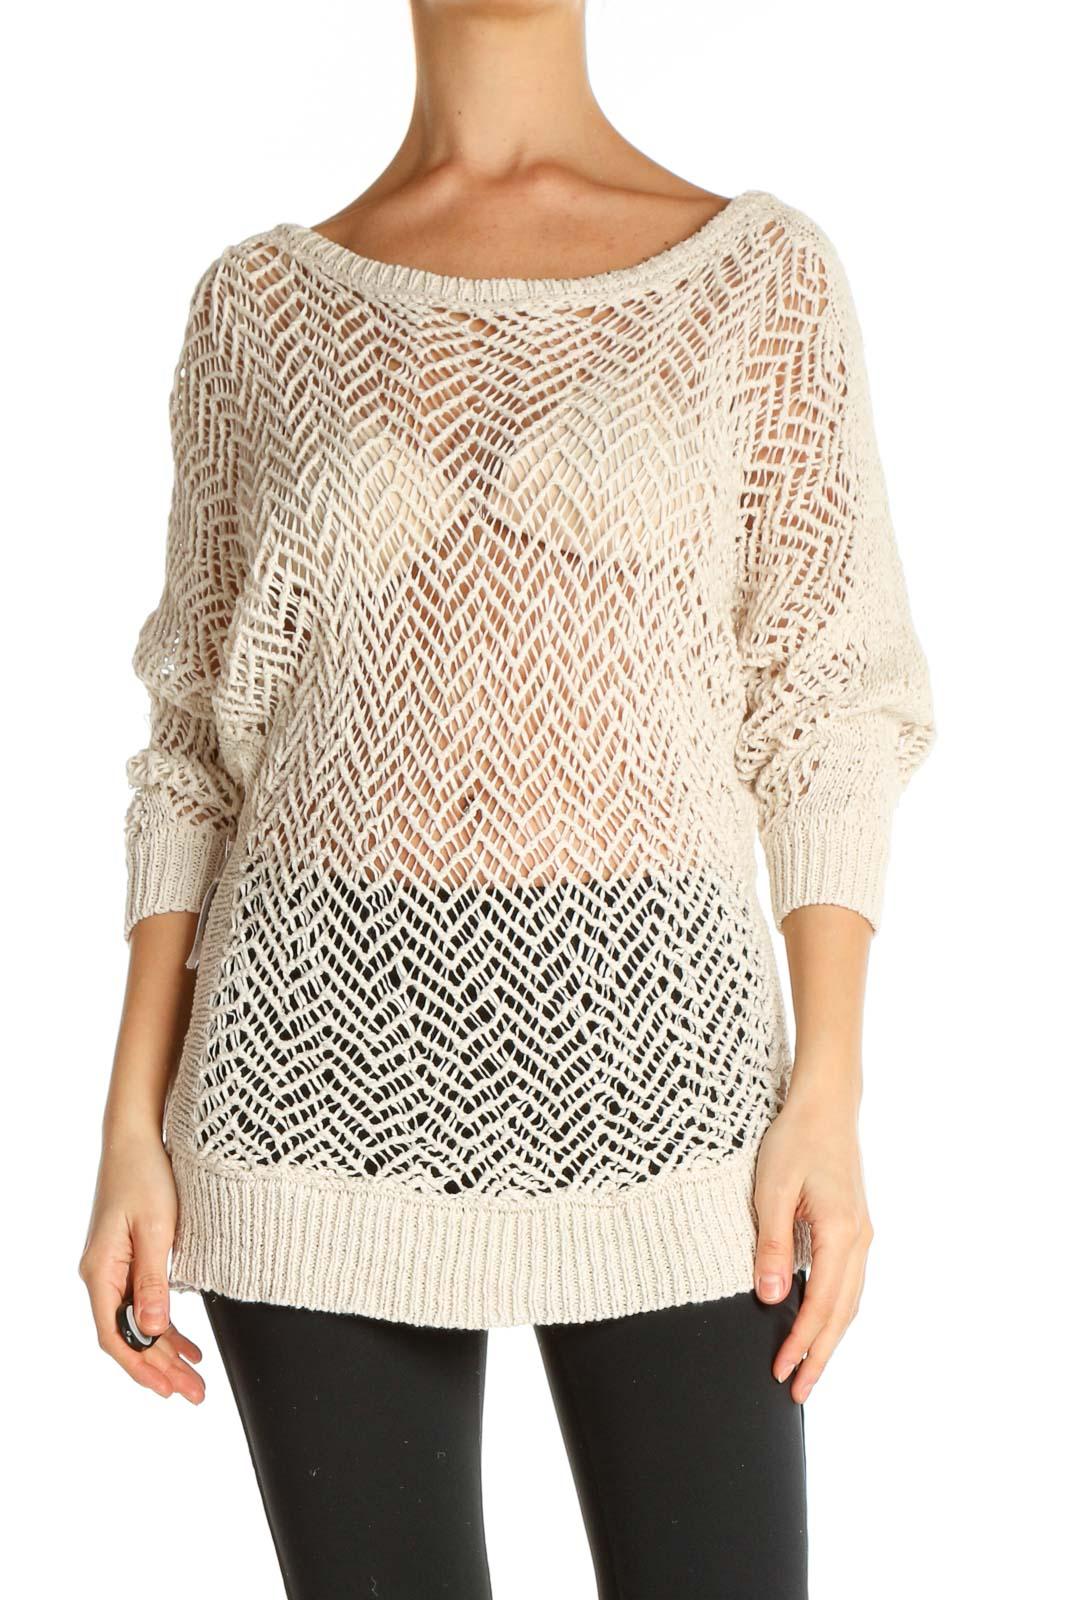 Beige Chevron All Day Wear Sweater Front